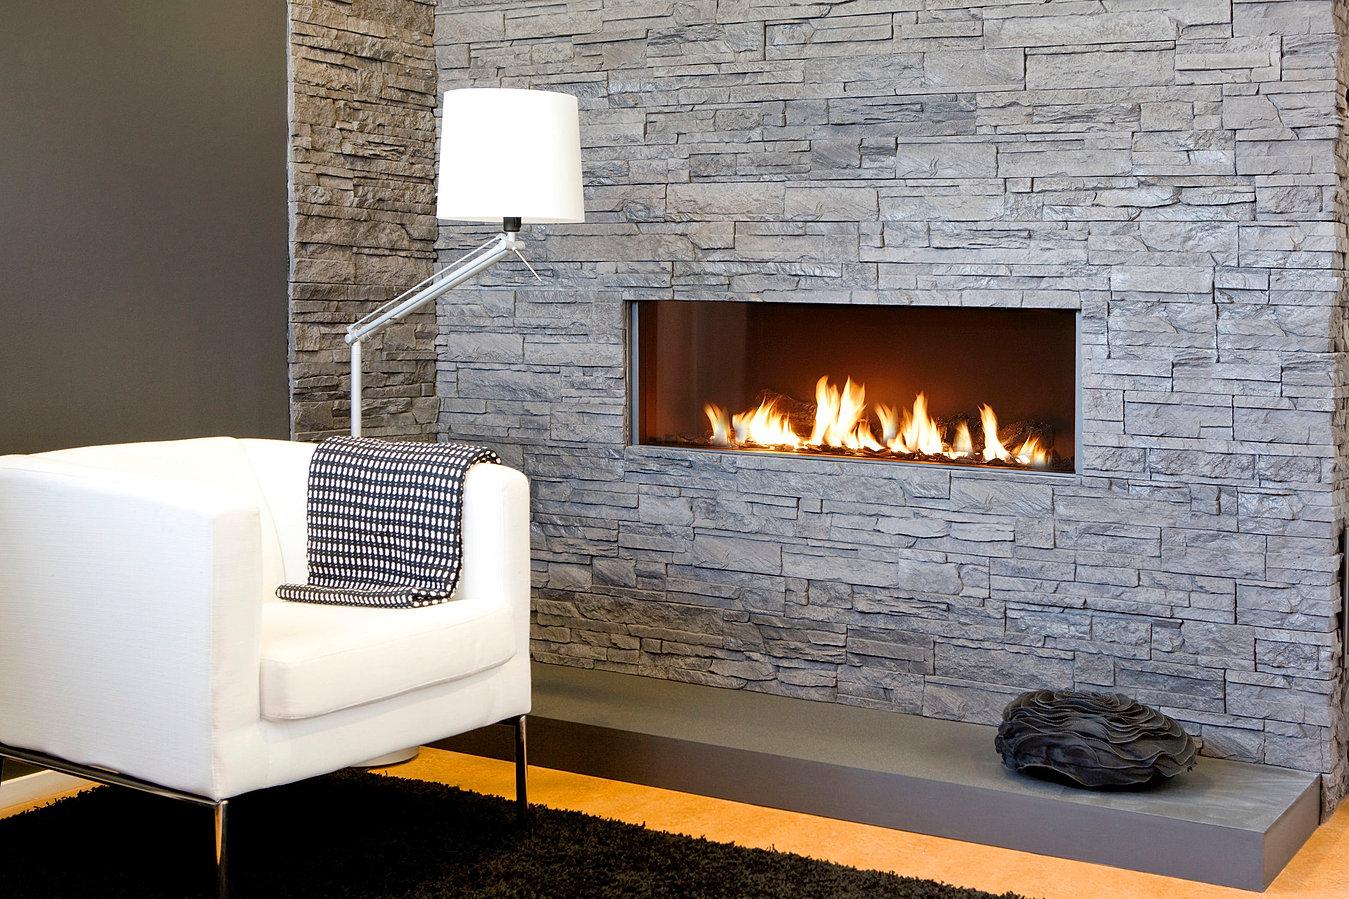 inspired stone natural stone veneer canada indoor fireplace ideas